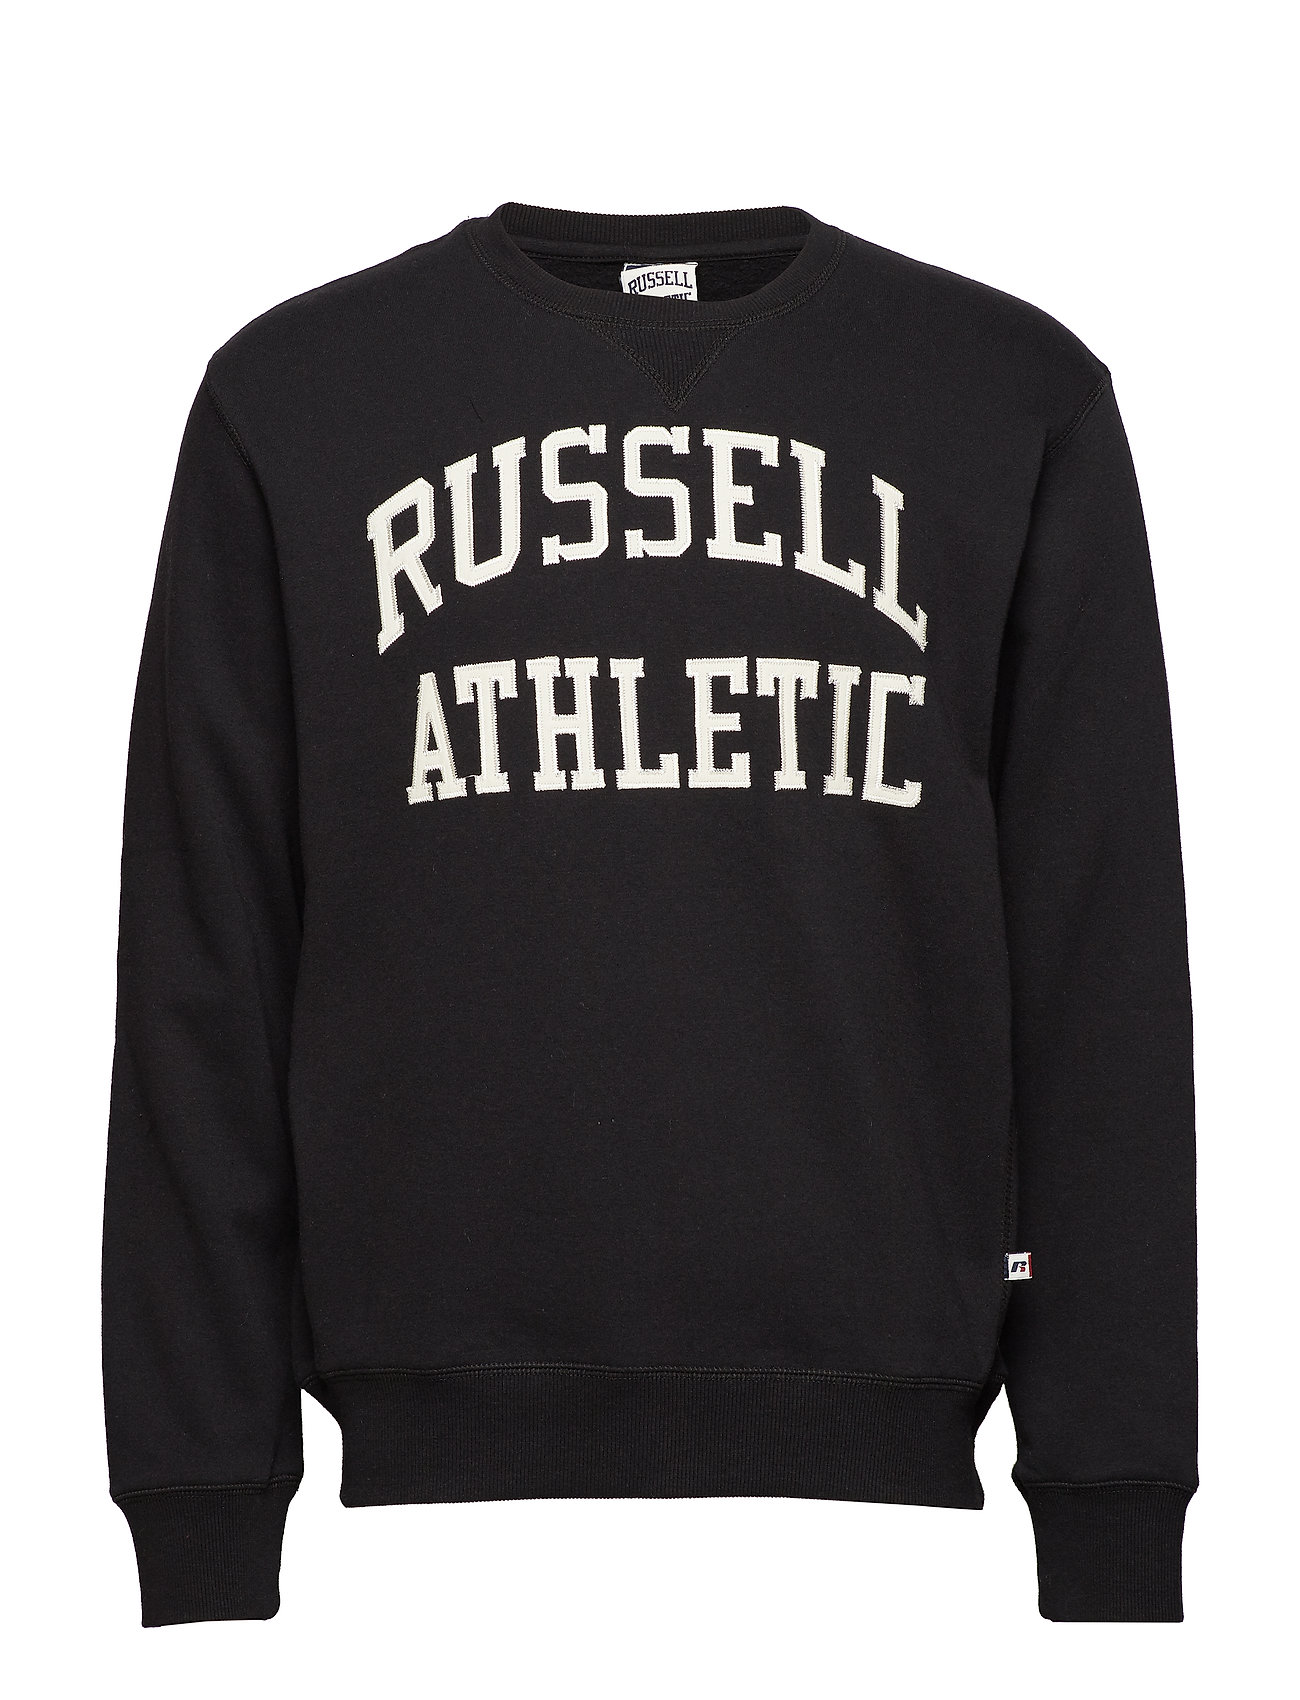 89ff68ccacd27 Ru Crew Neck Tackle Twill Sweatshirt (Black) (£45) - Russell ...